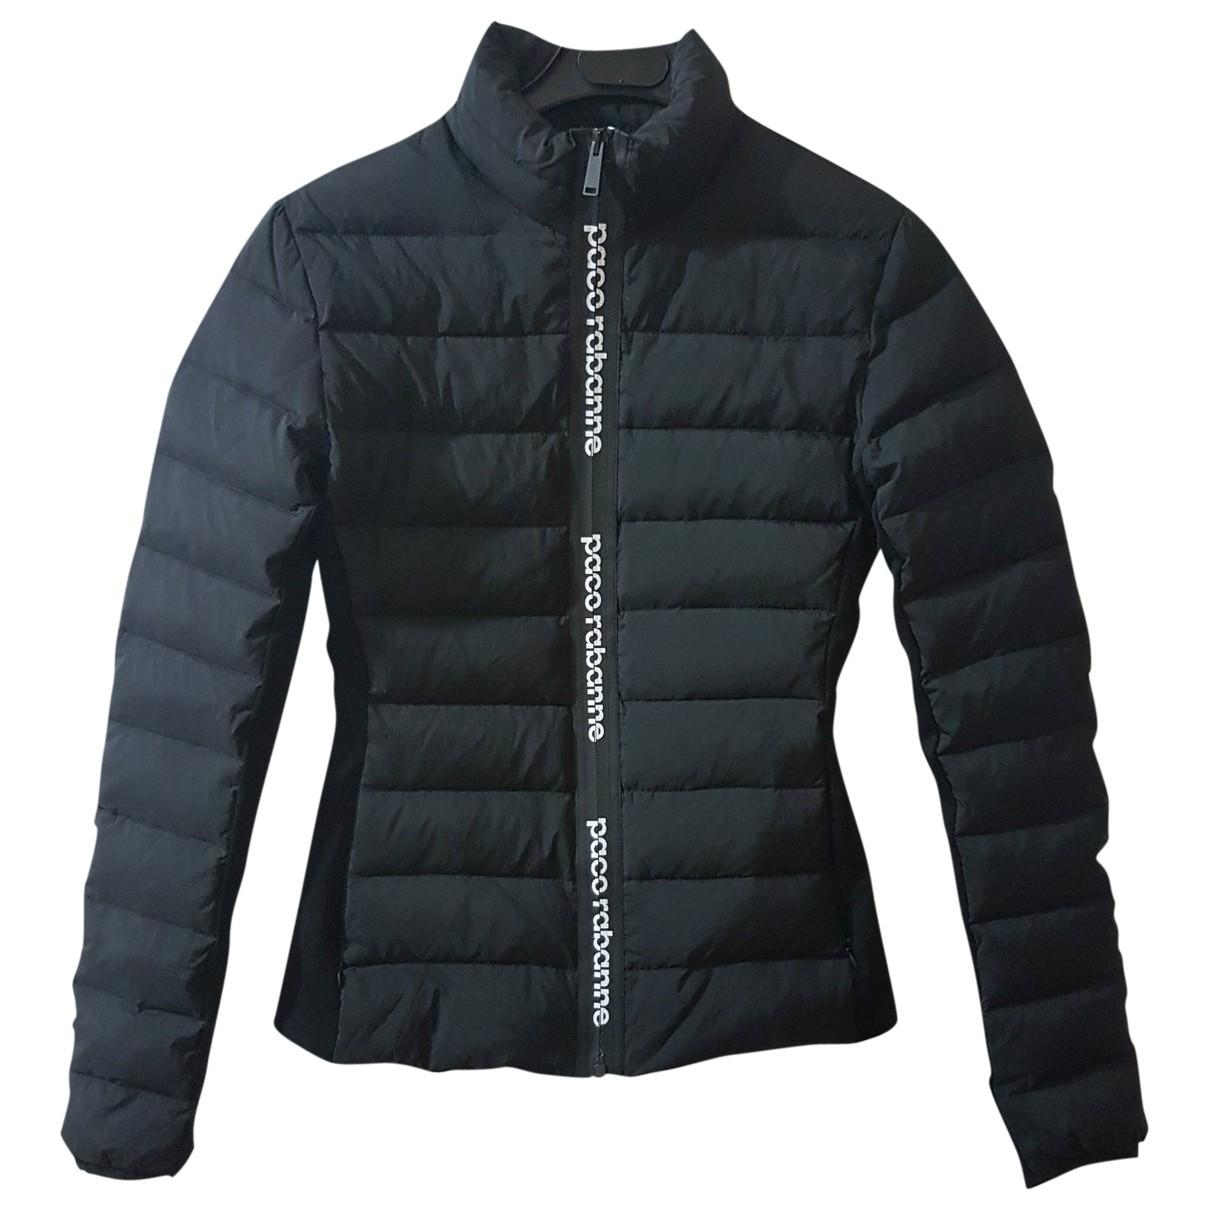 Paco Rabanne \N Black coat for Women XS International